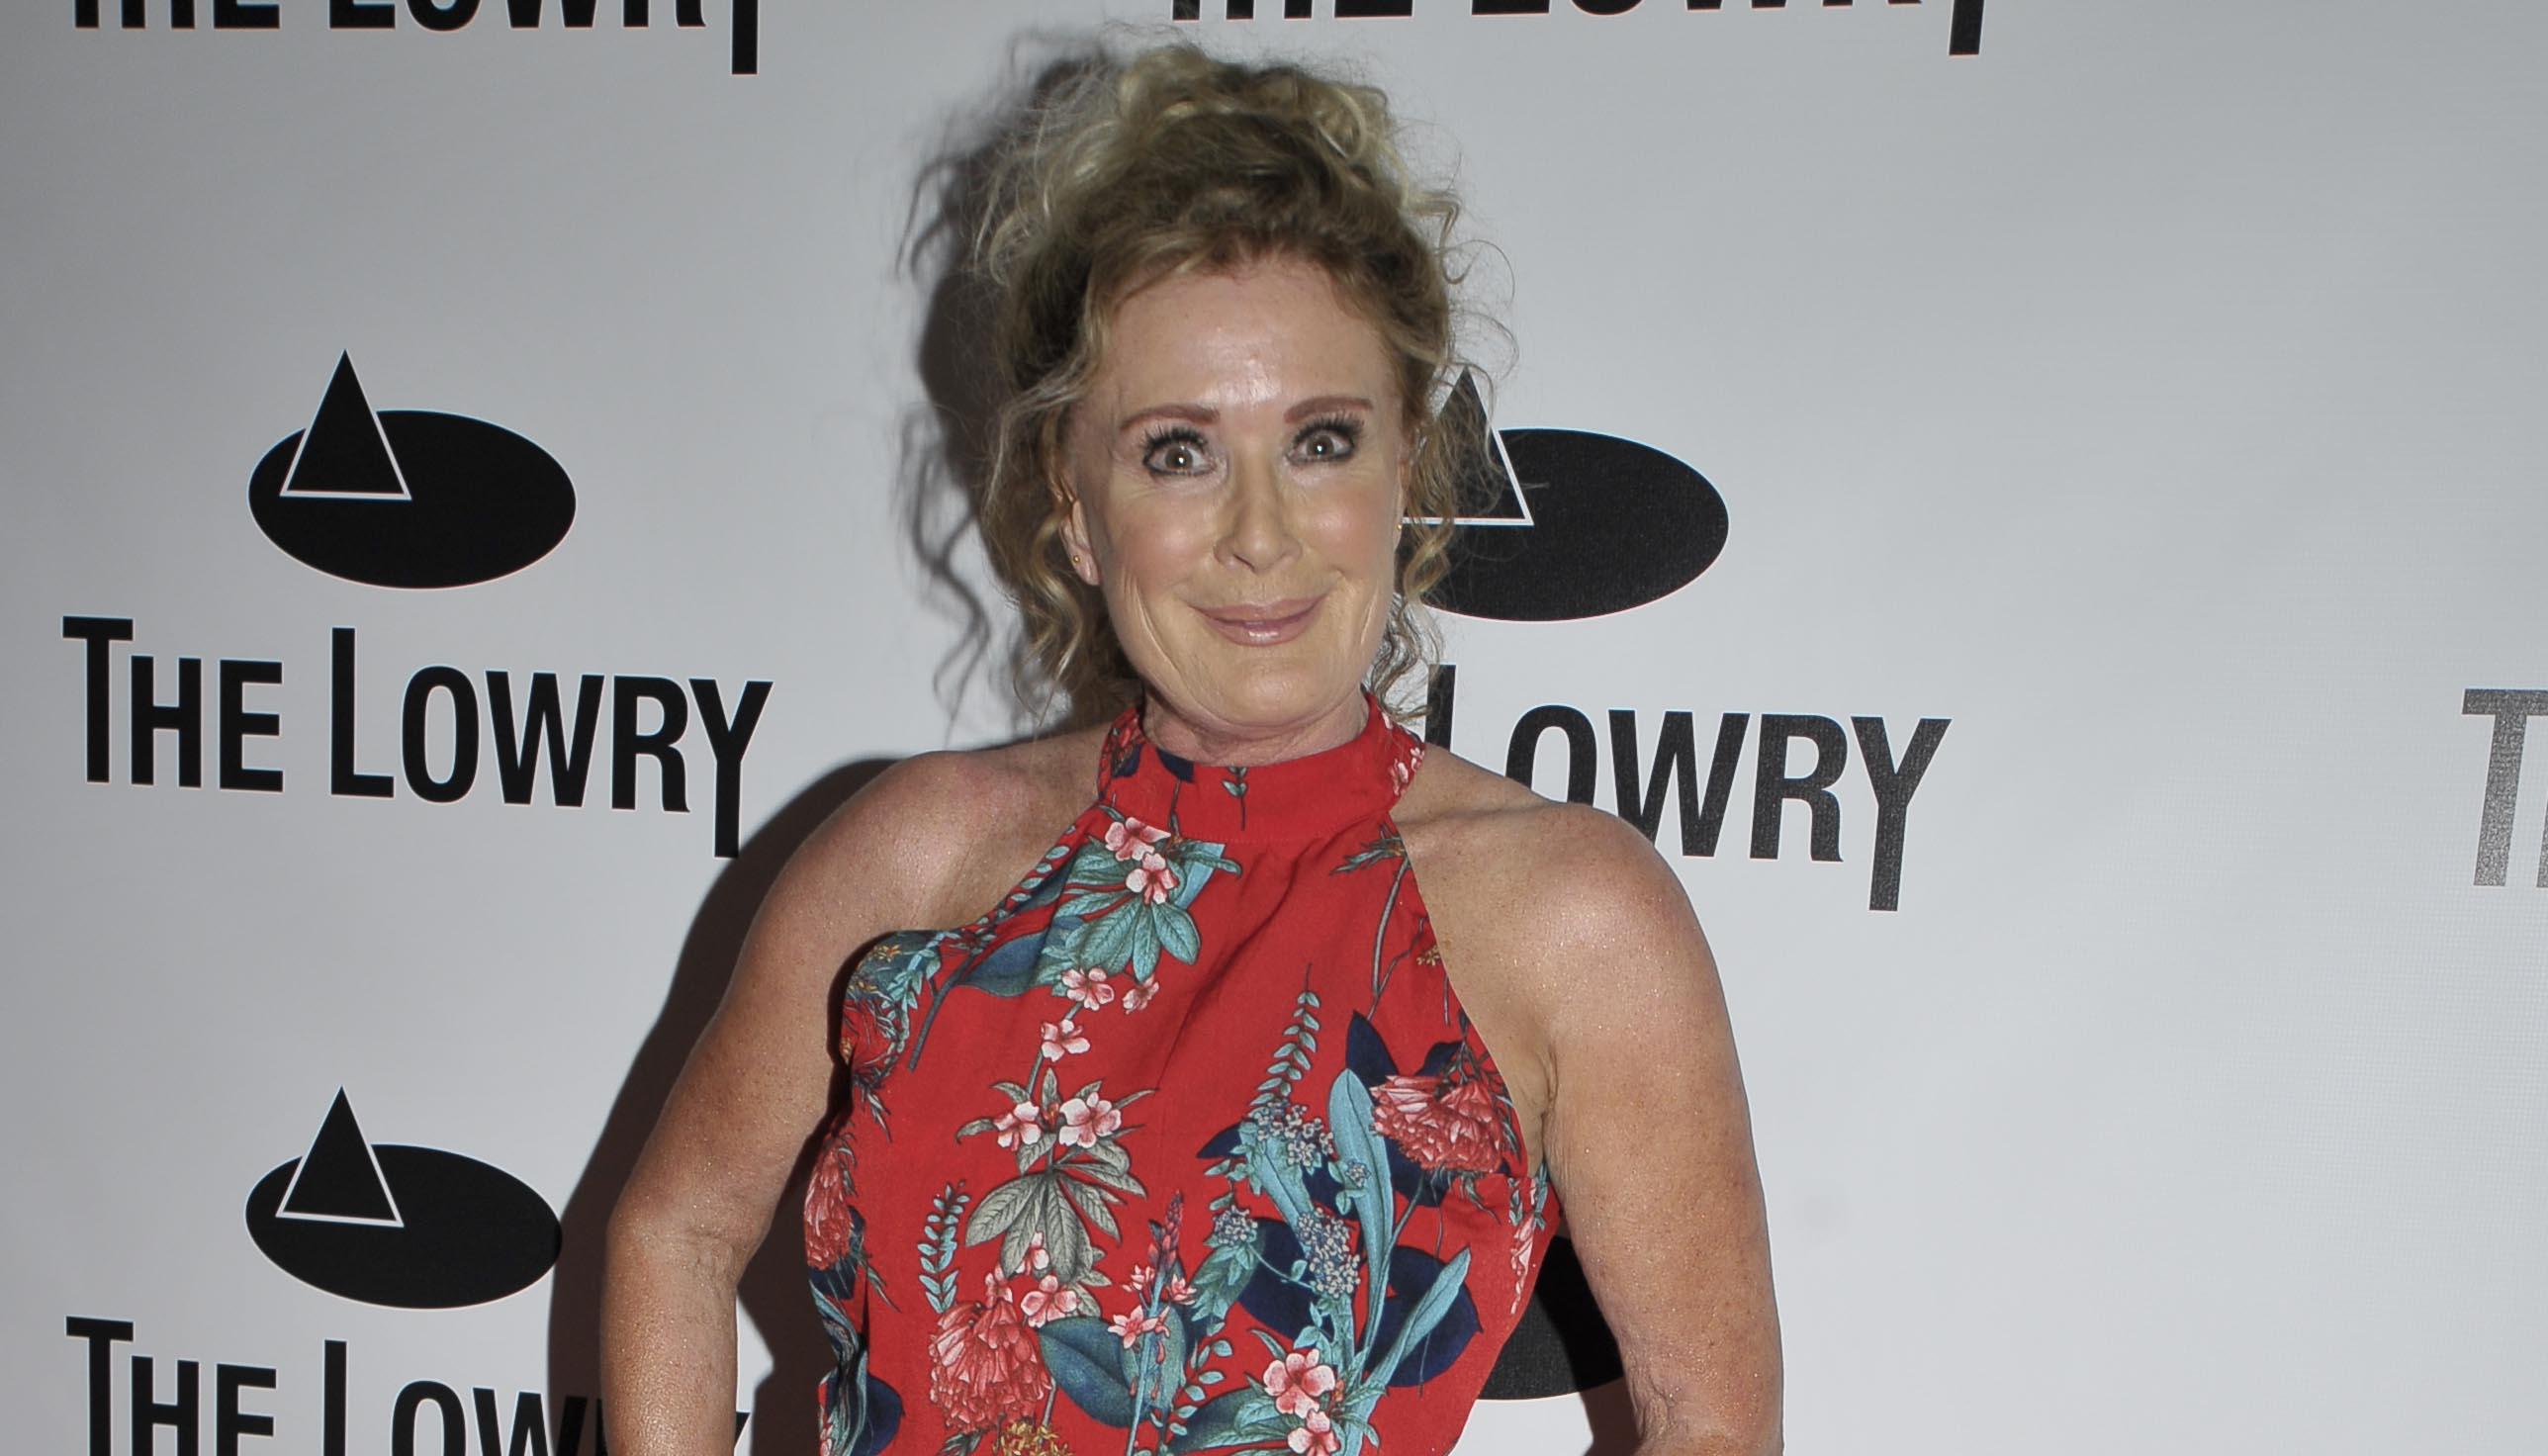 Coronation Street's Beverley Callard reveals fury when husband swore at a fan